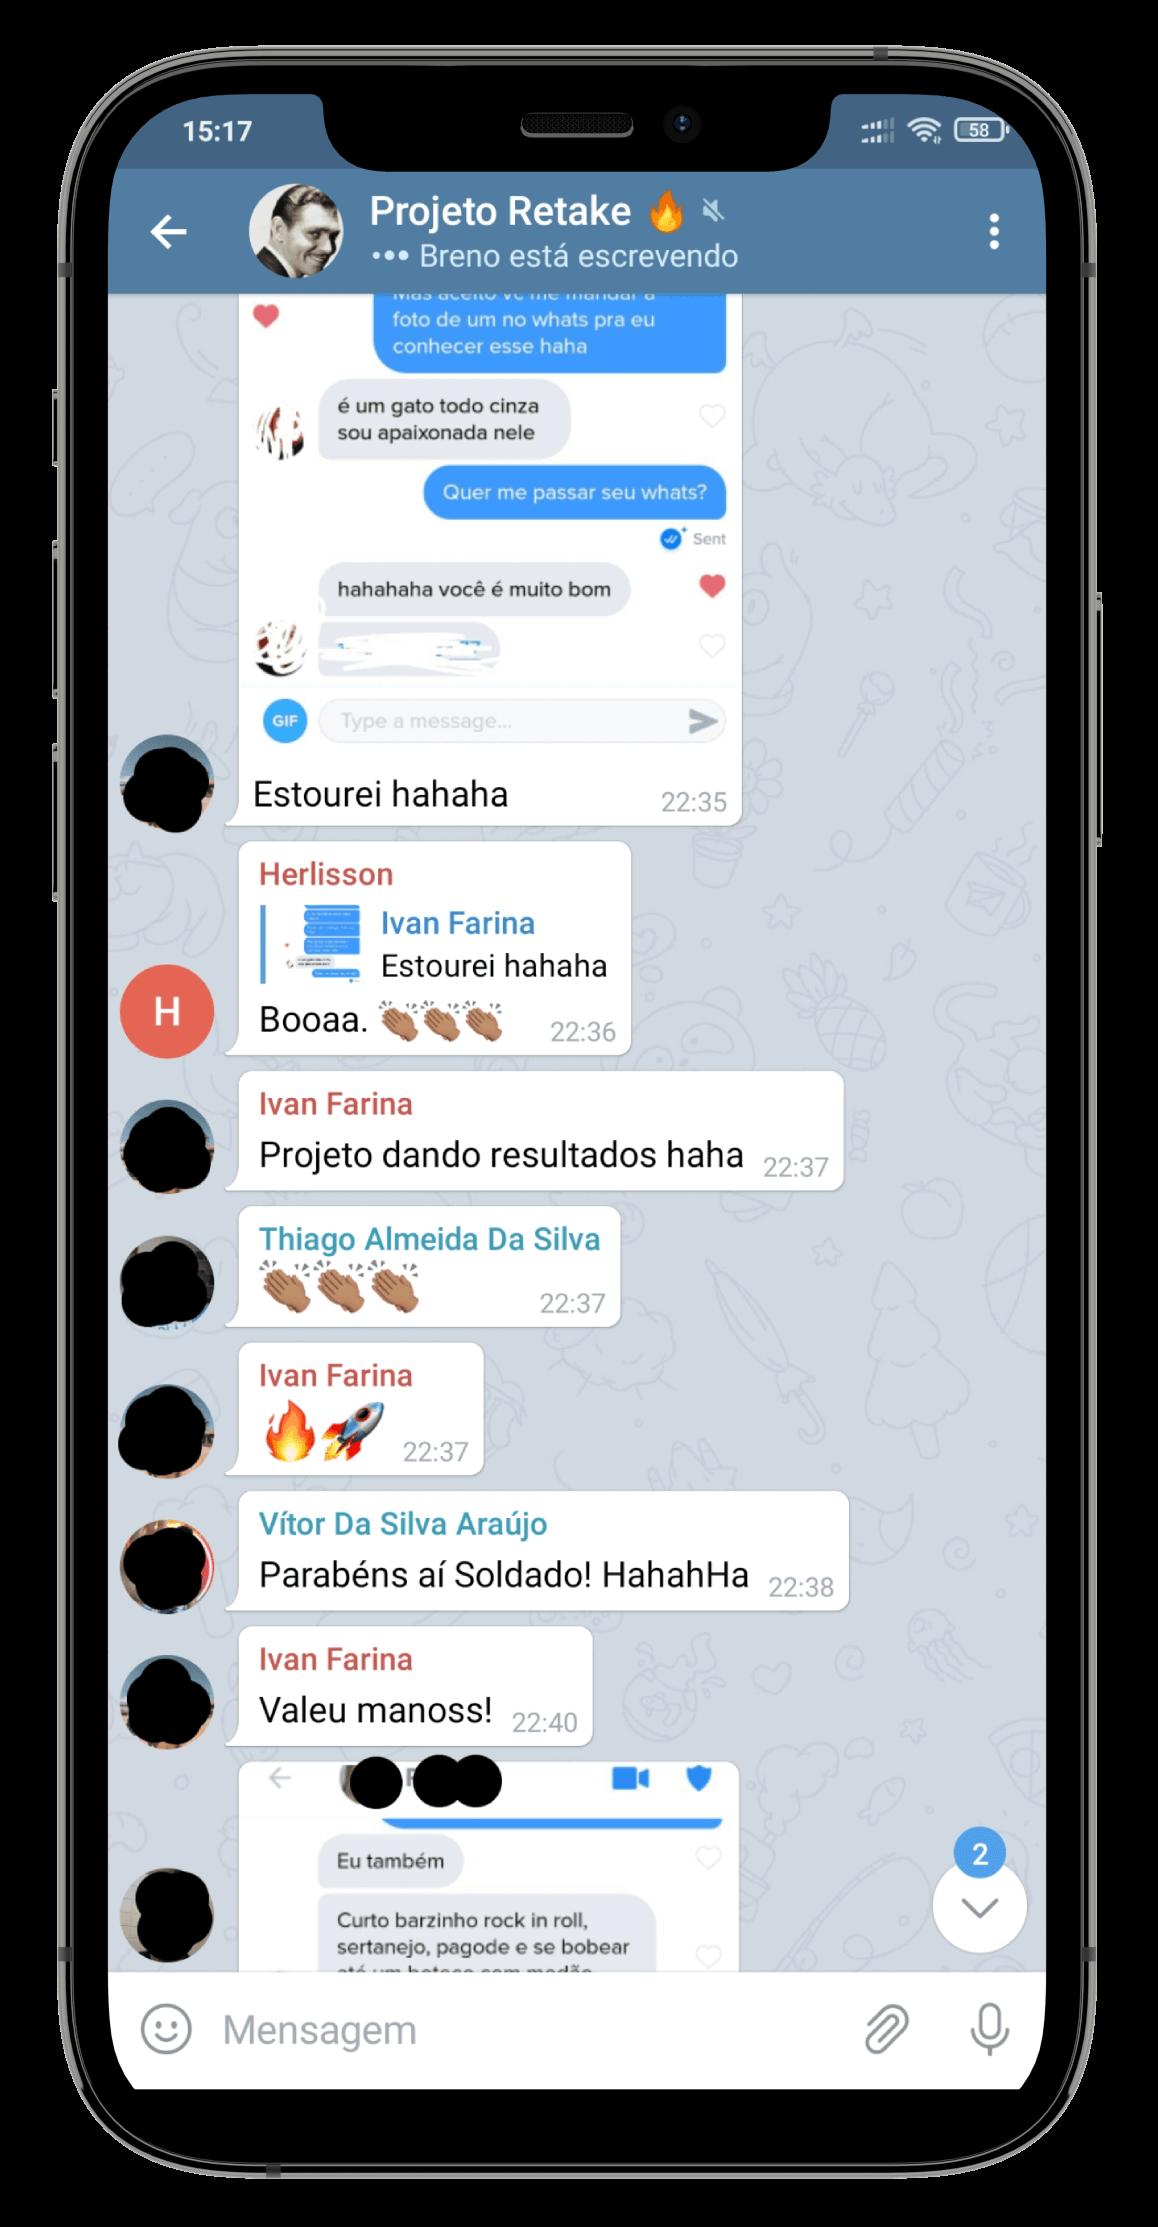 projeto-retake-telegram-4.png